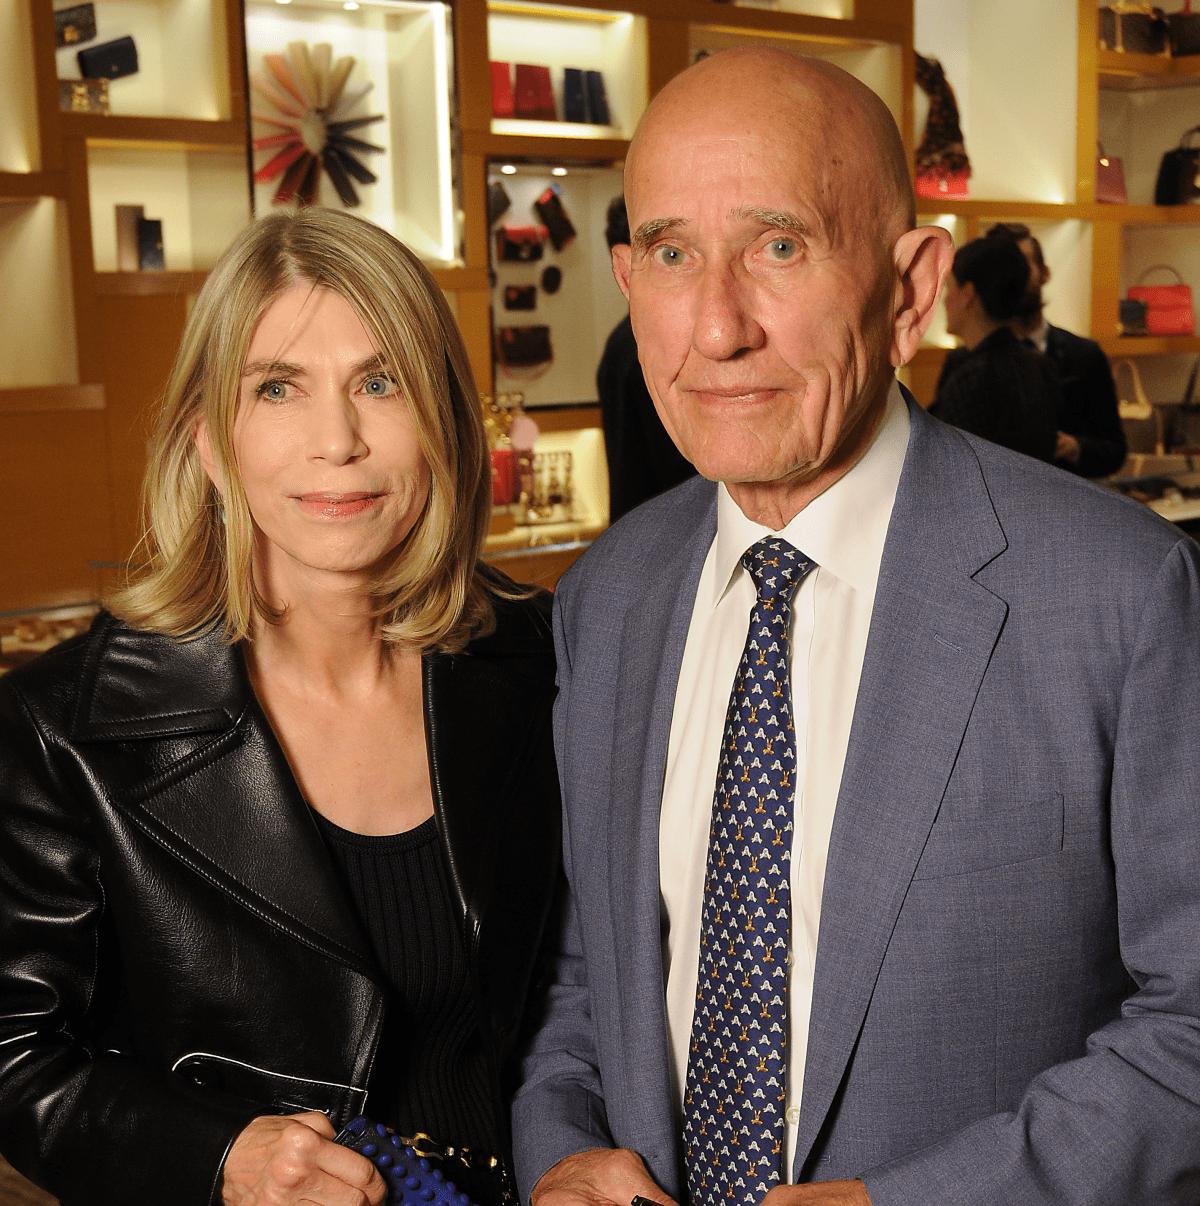 Houston, Louis Vuitton Alley Theatre Salute, September 2015, Marsha and John Beeson